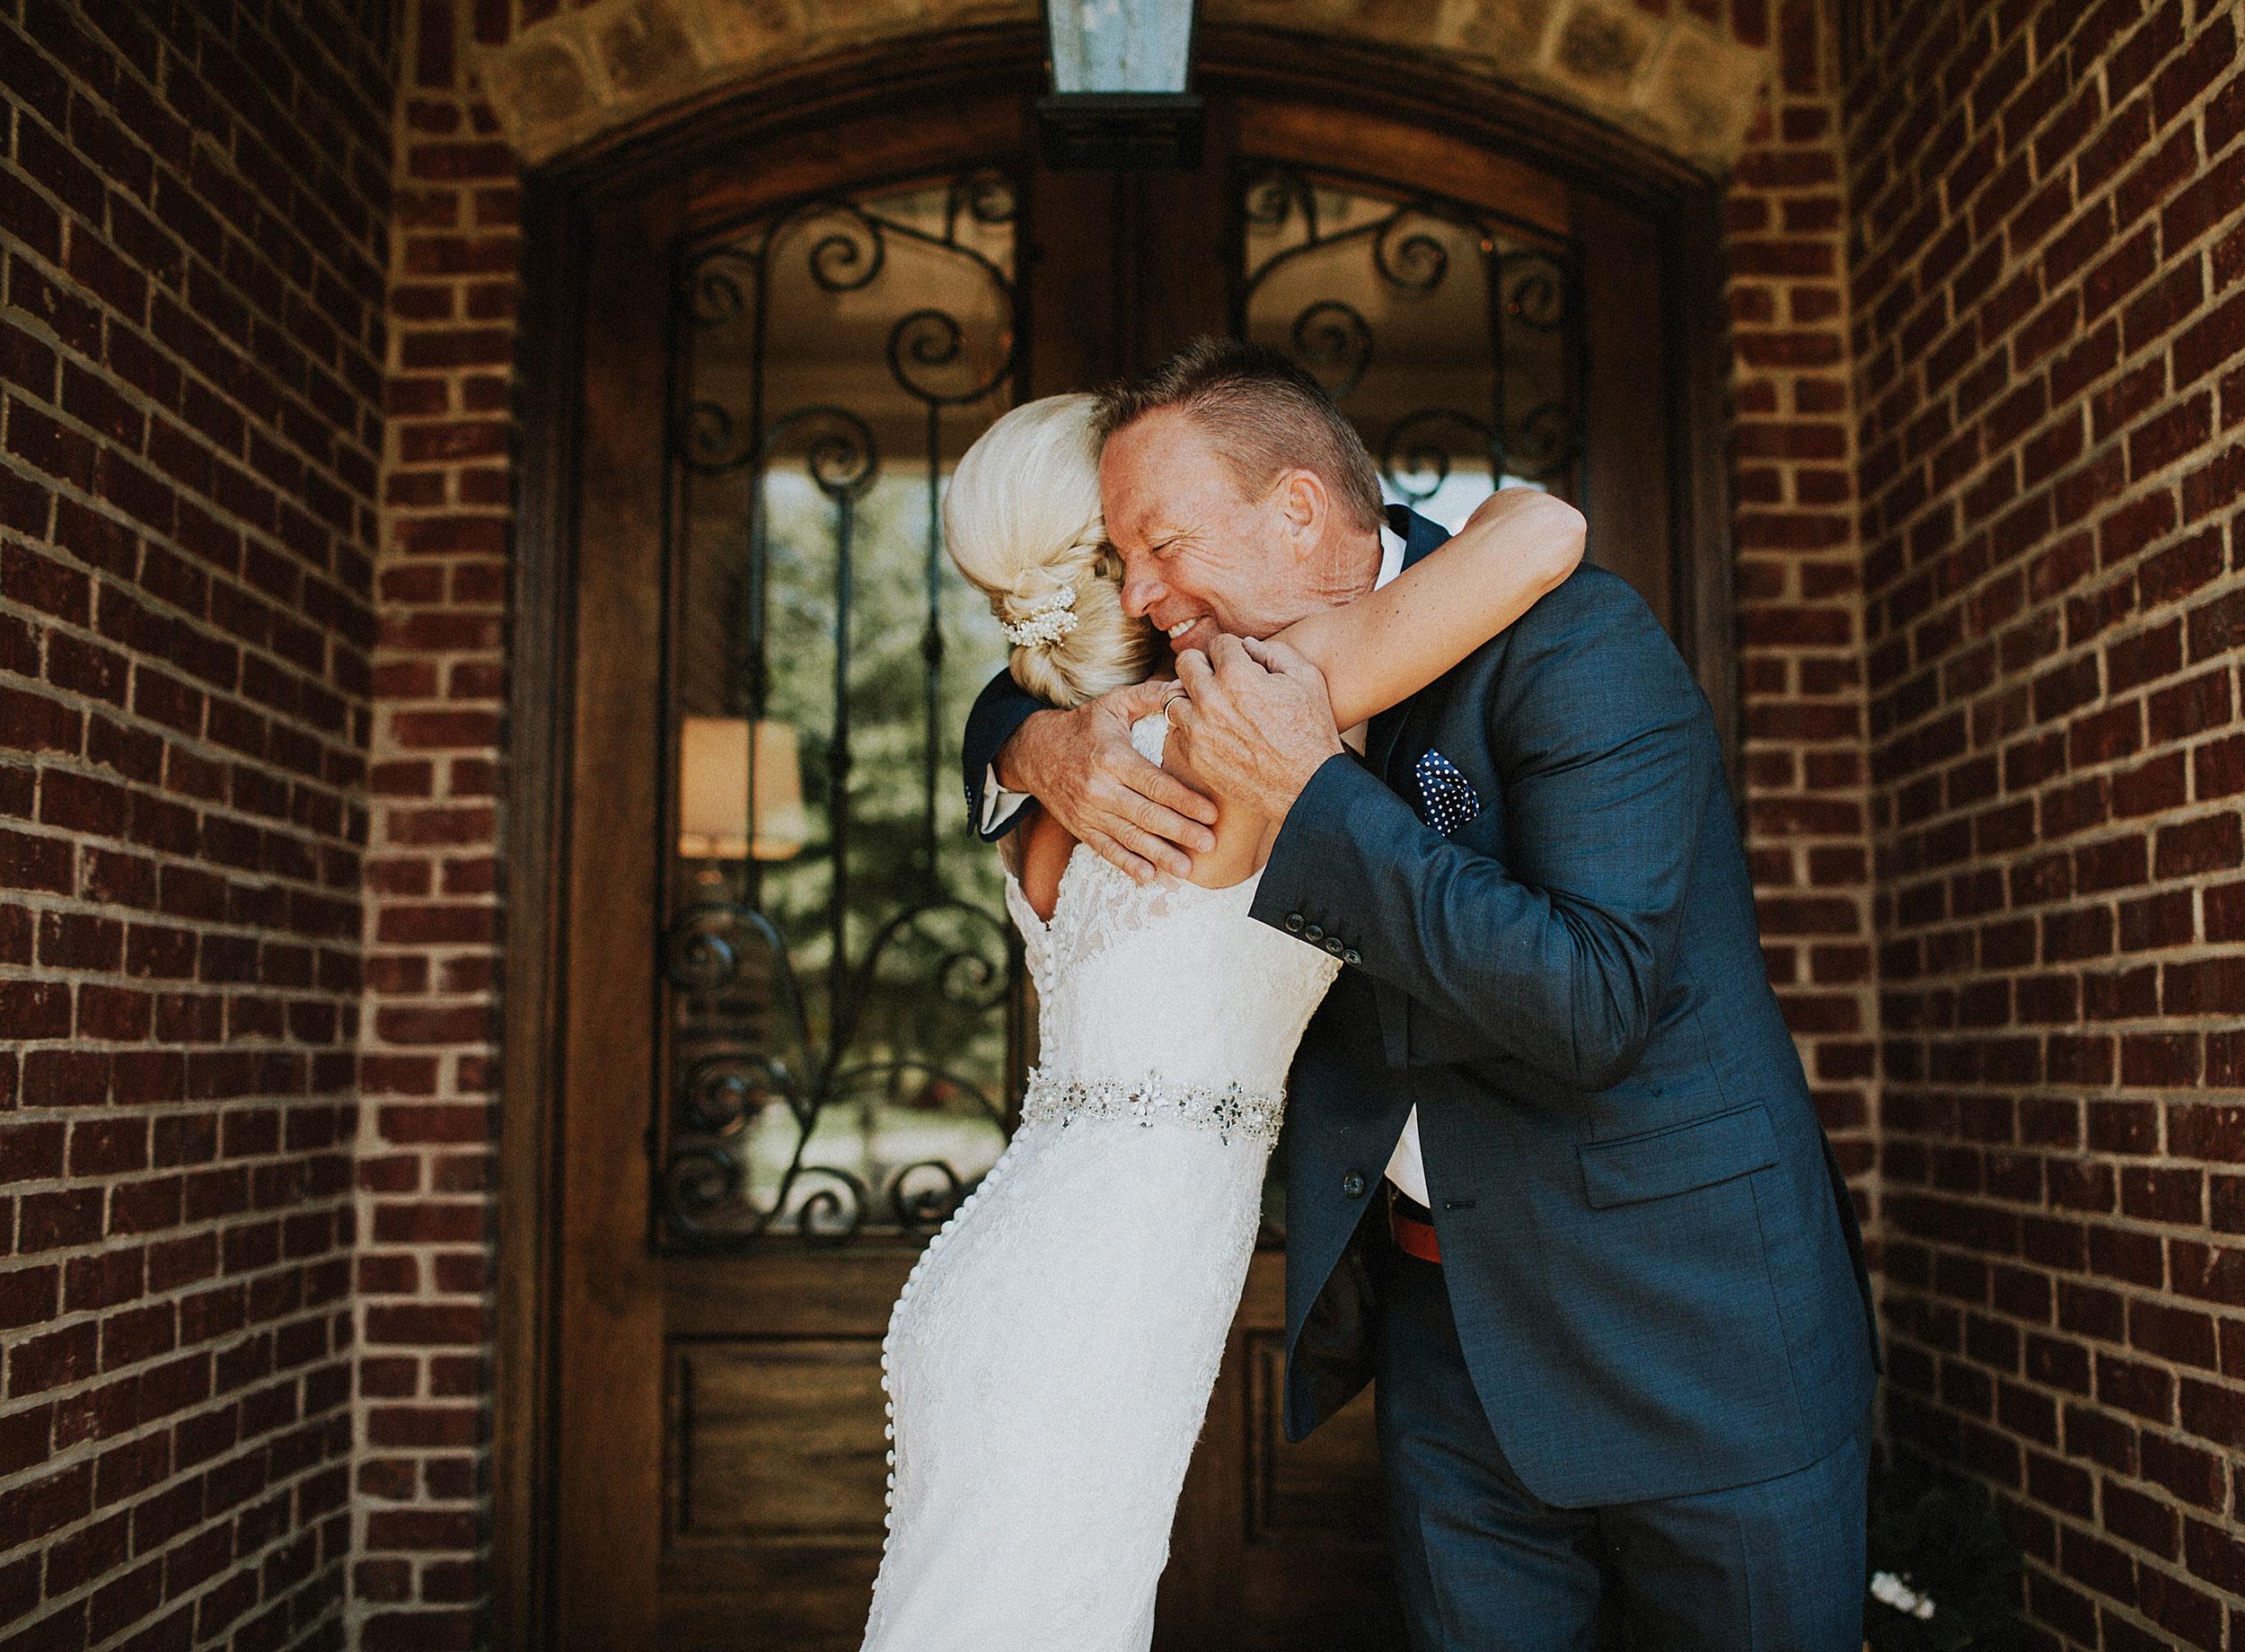 olmsted-wedding-louisville-kentucky-015.JPG